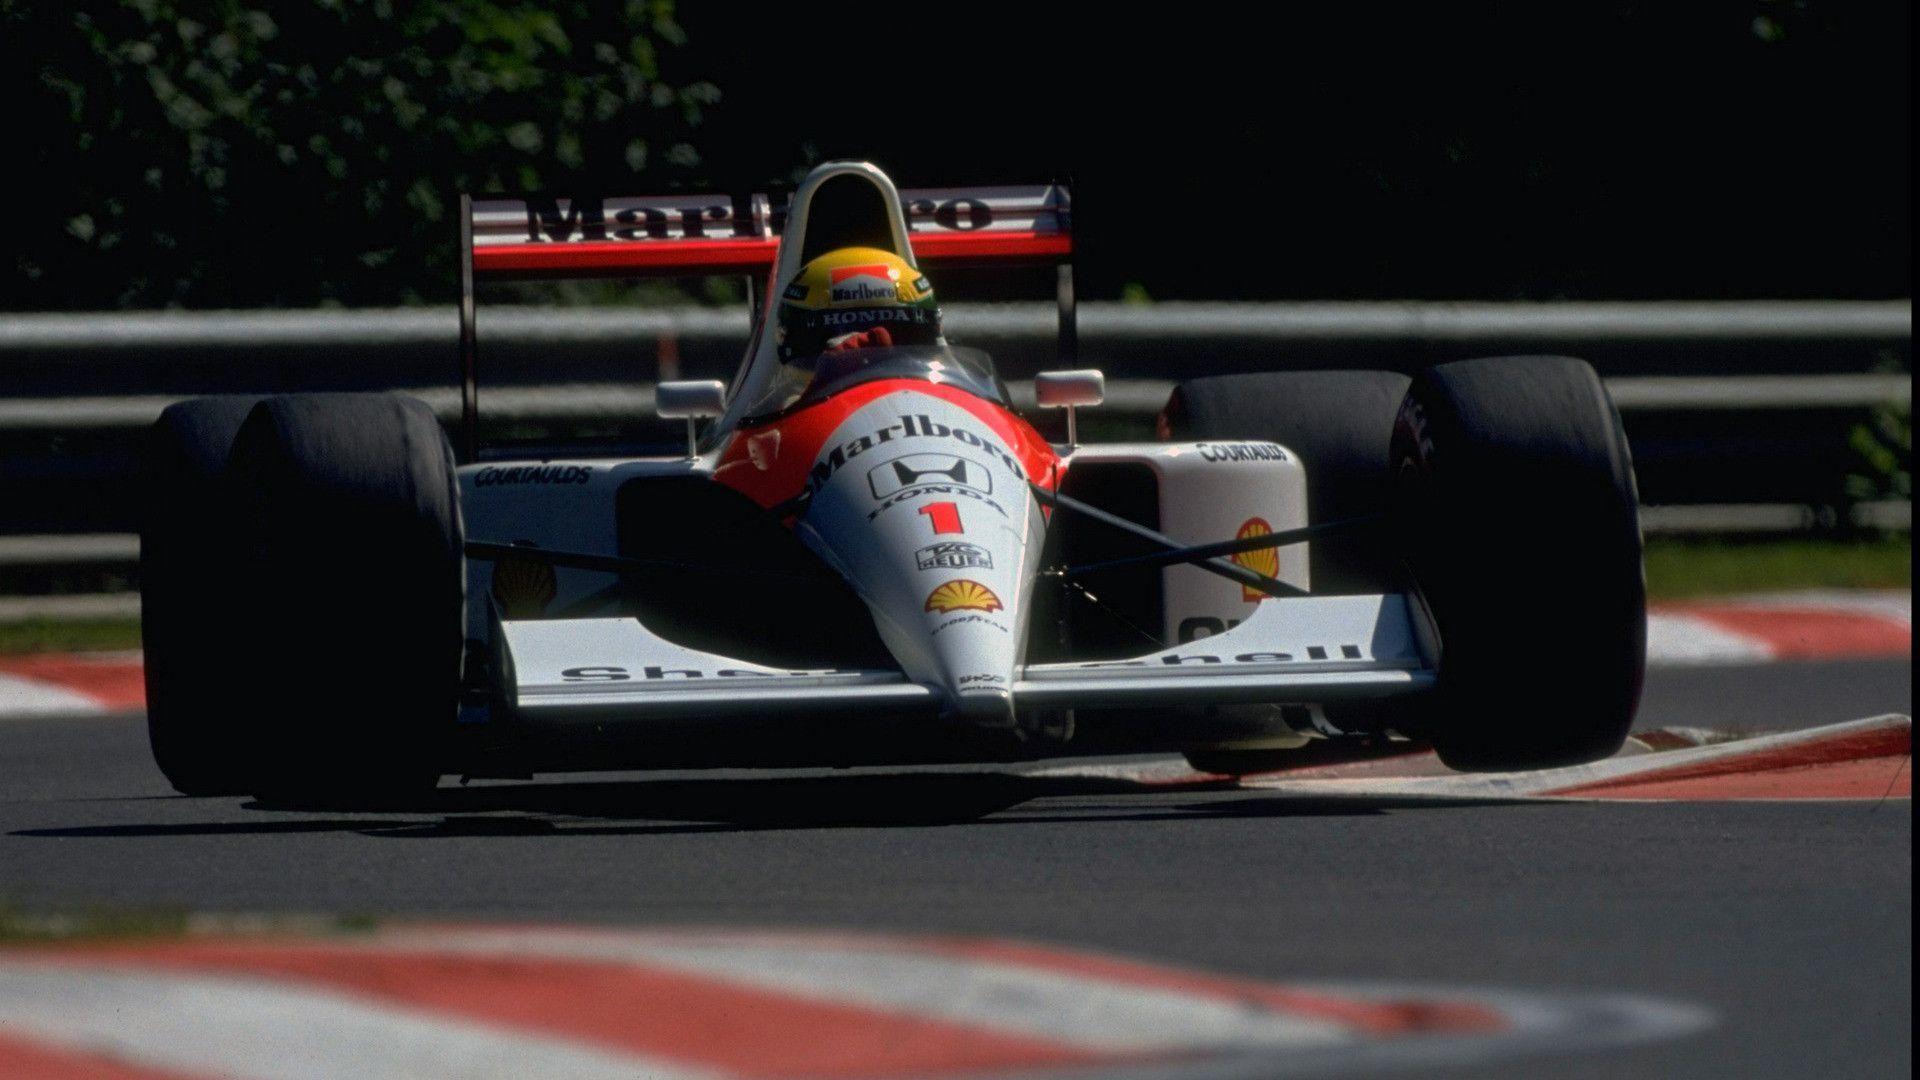 Ayrton Senna Wallpapers Wallpaper Cave Ayrton Senna